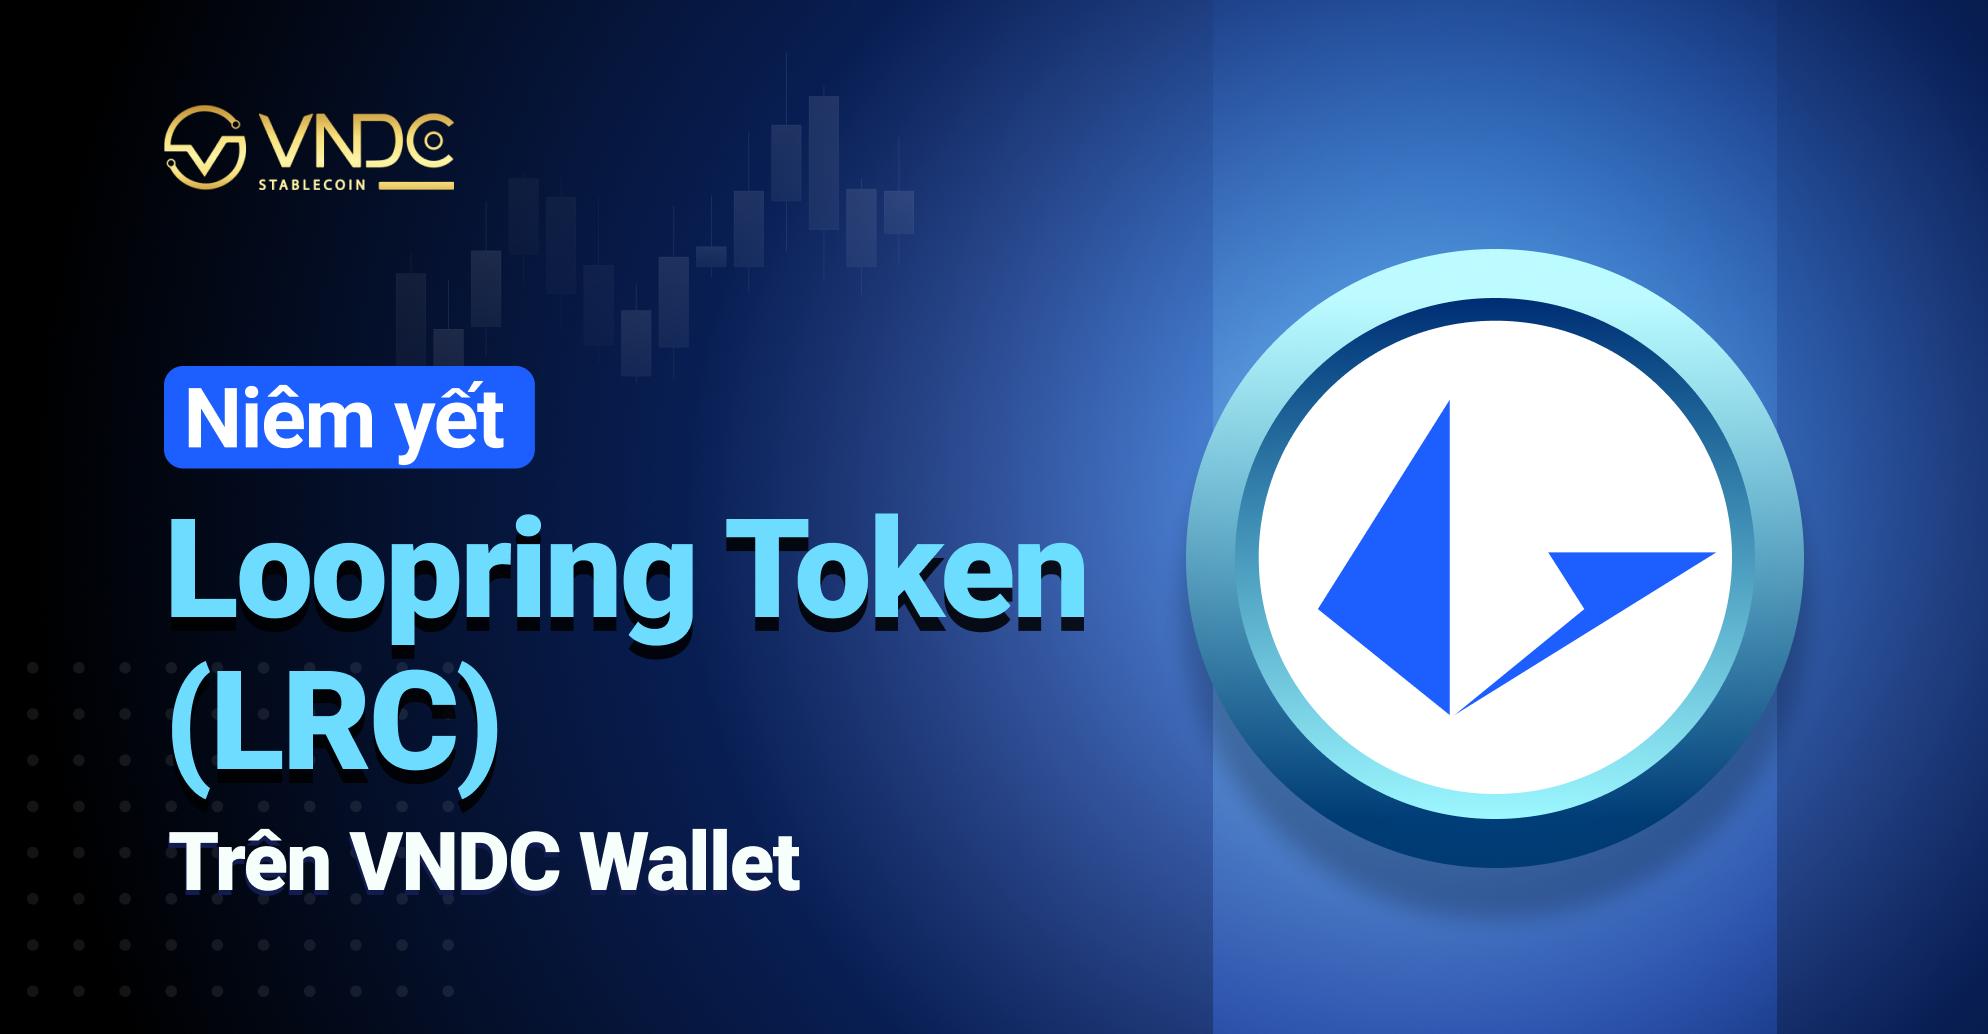 Niêm yết Loopring Token (LRC) trên VNDC Wallet